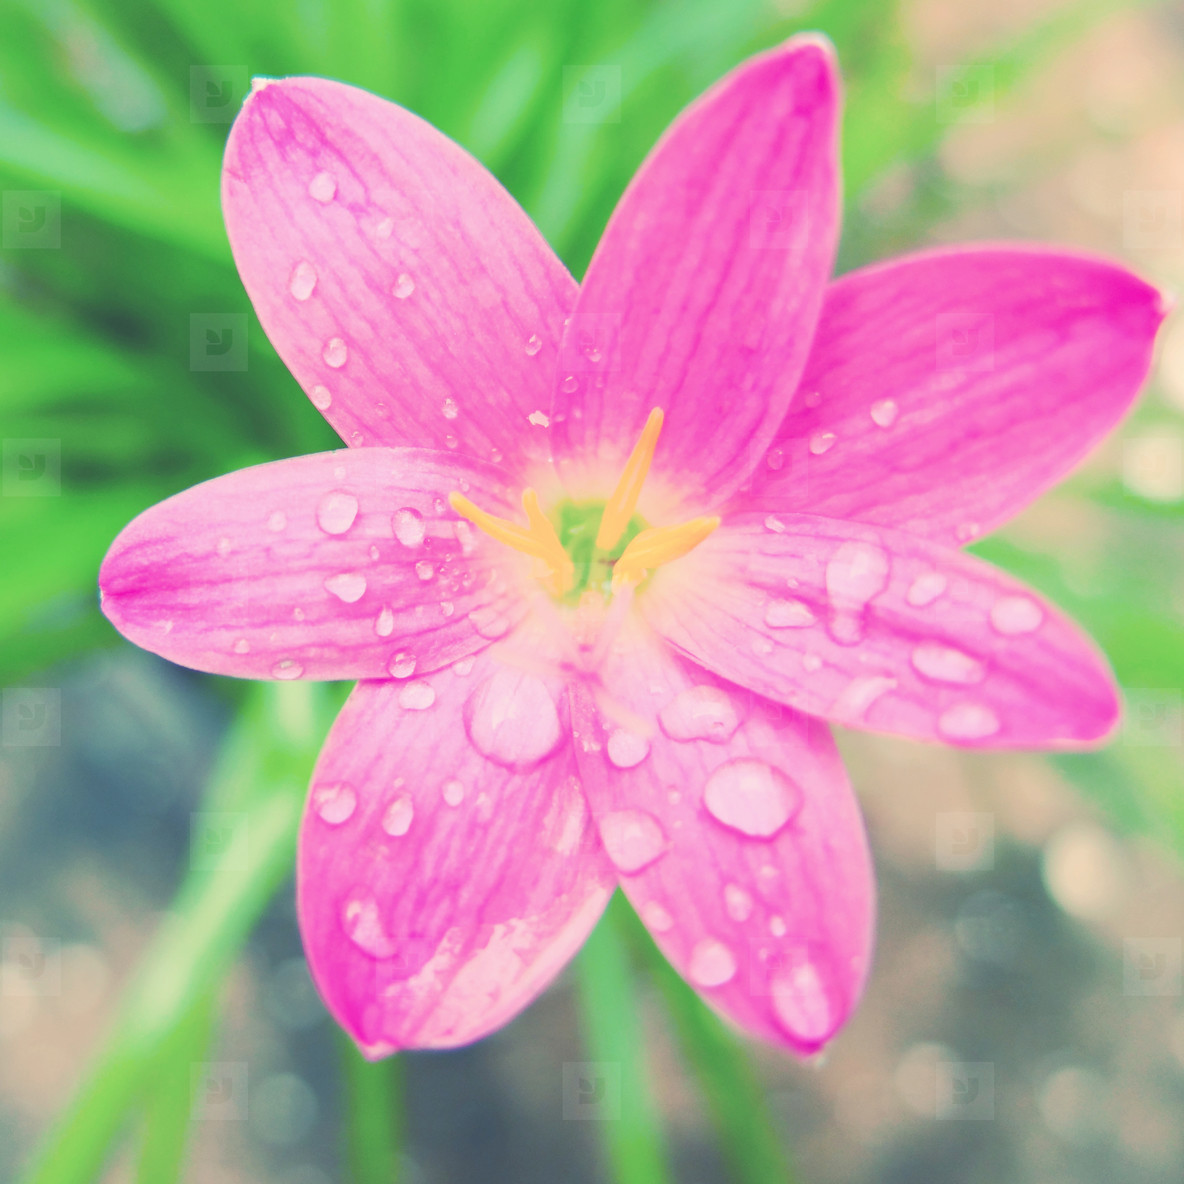 Pink blossom flower